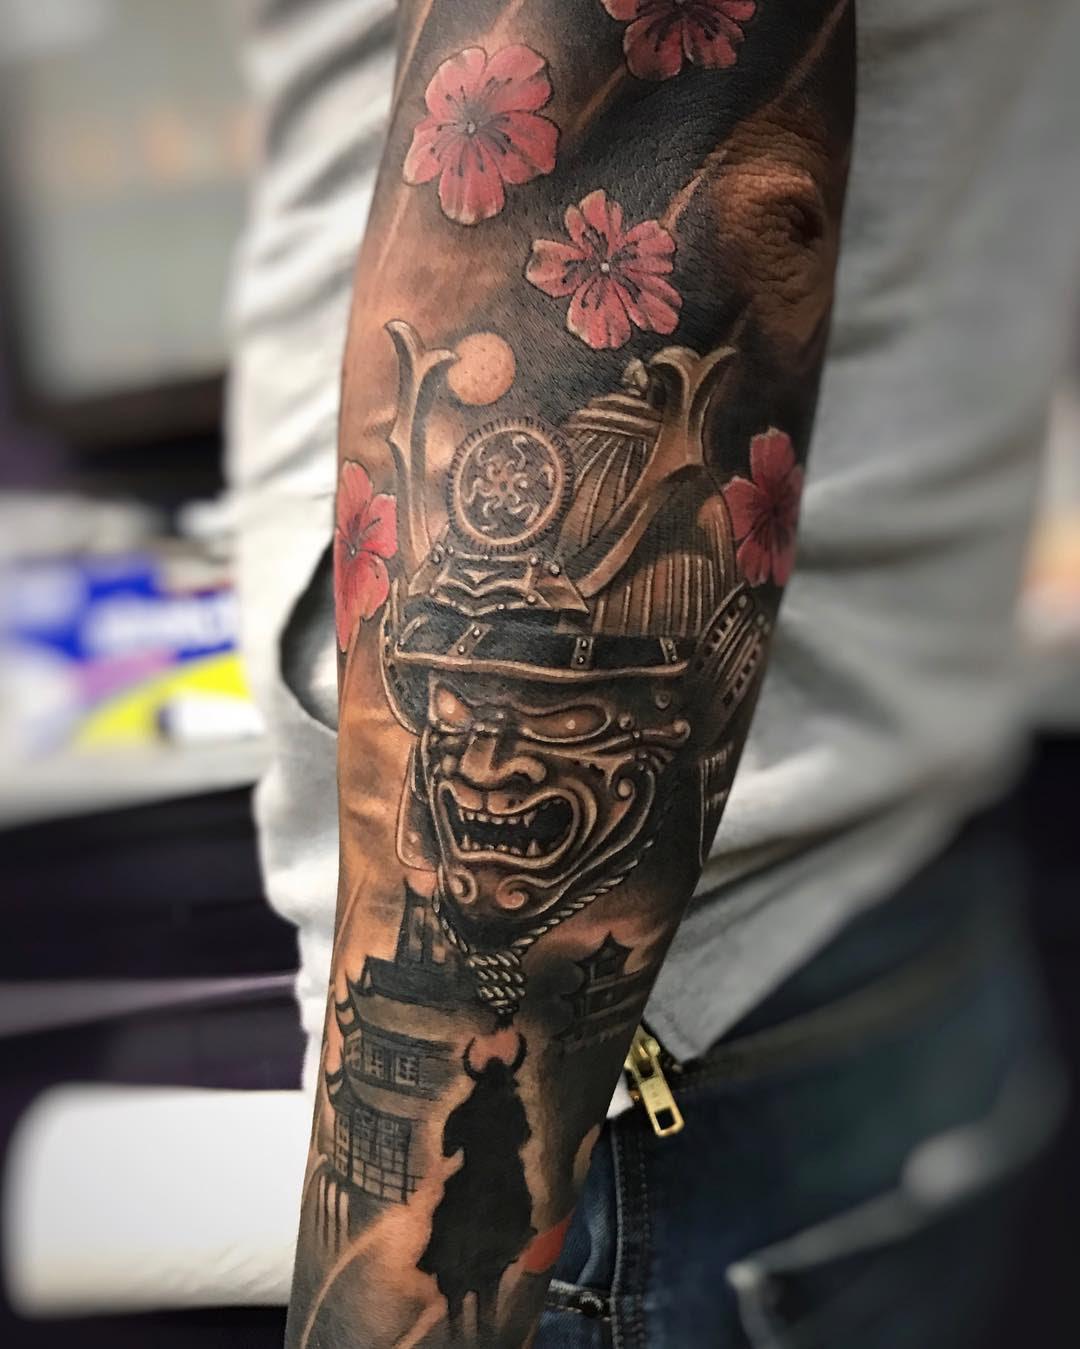 90+ Cool Half Sleeve Tattoo Designs & Meanings - Top Ideas